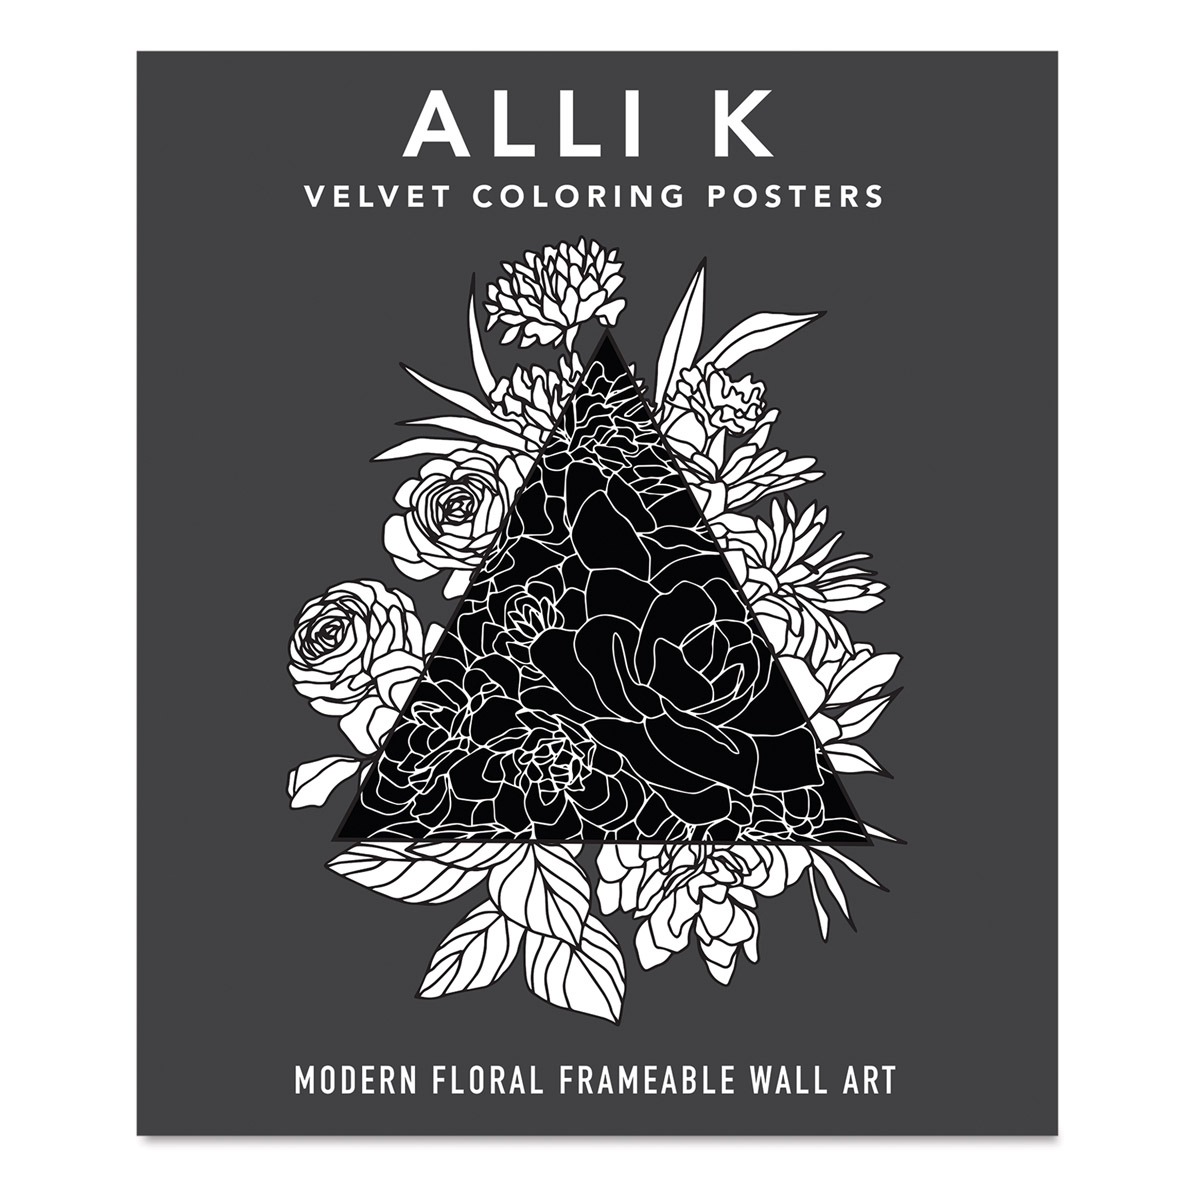 Velvet Coloring Posters: Modern Floral Frameable Wall Art